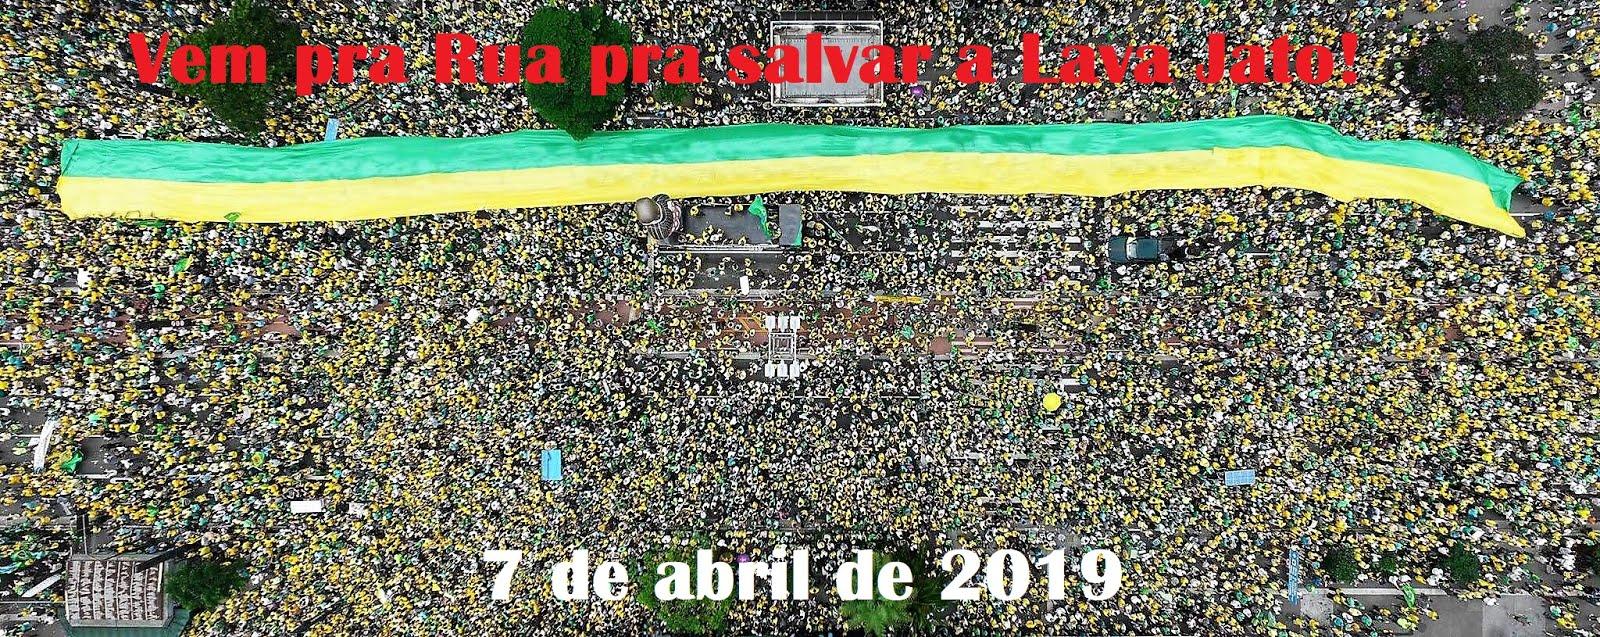 7 de abril: Brasil